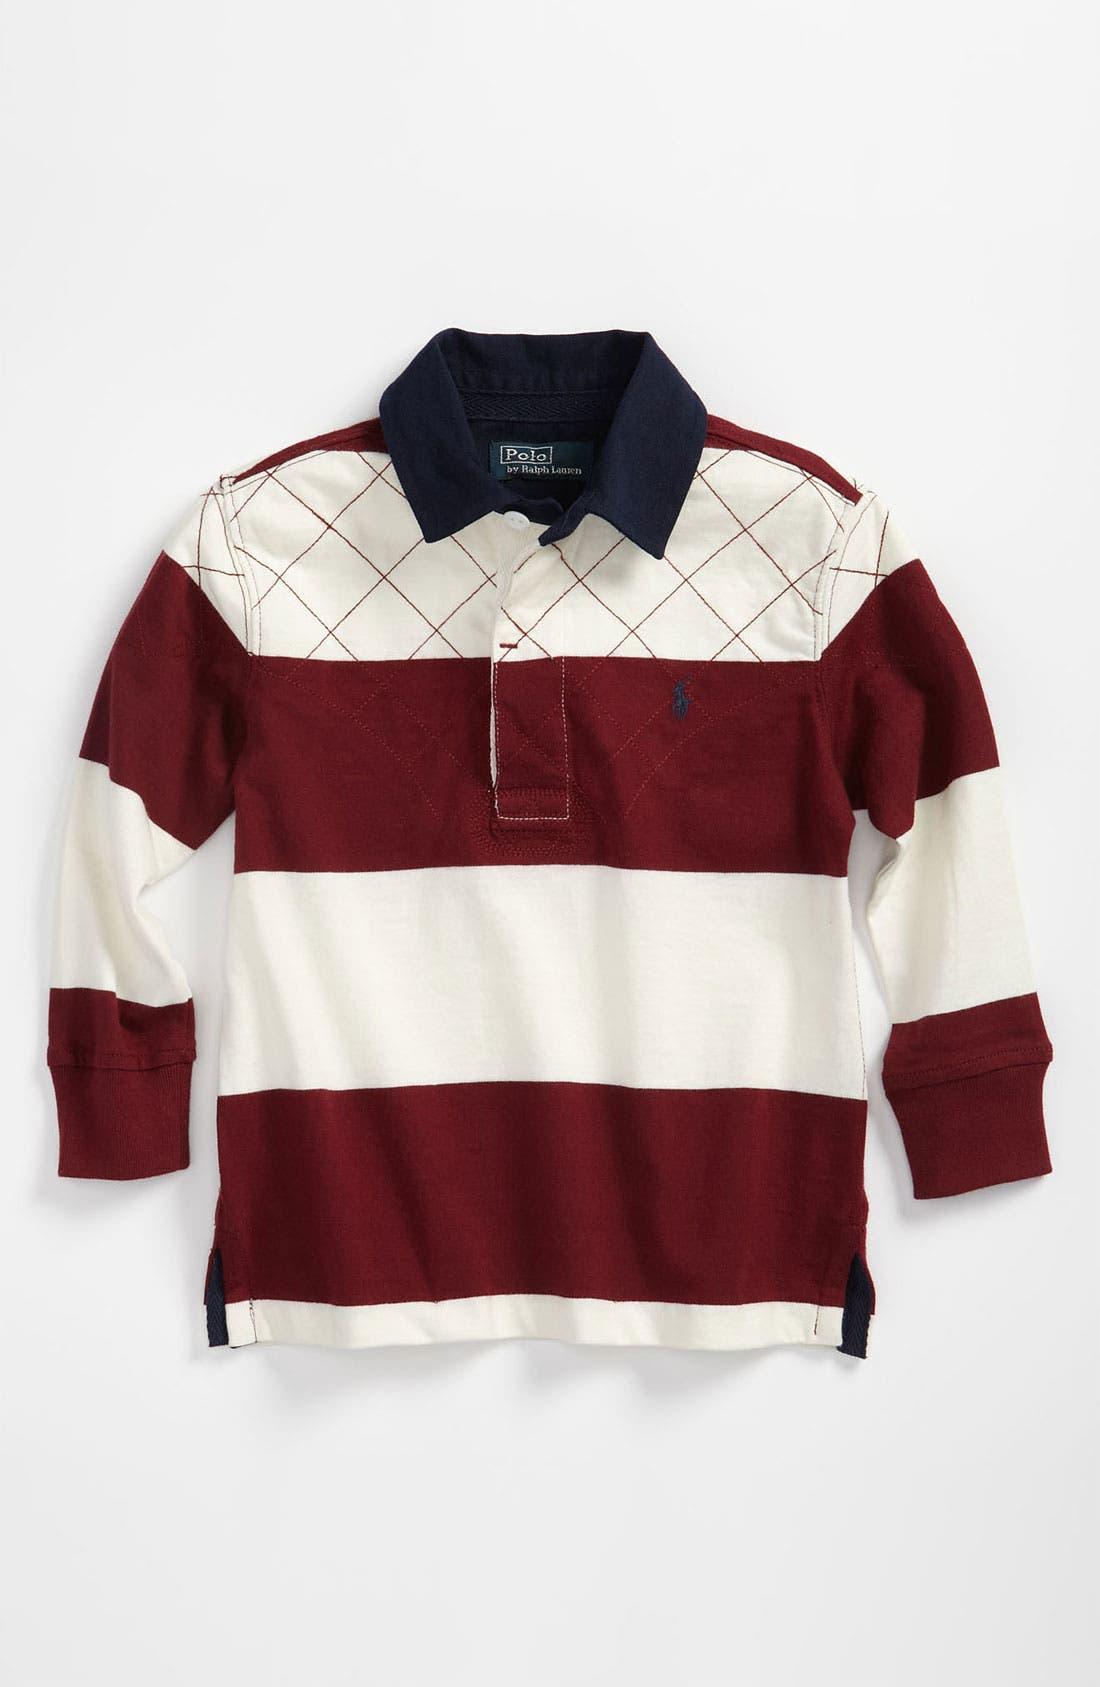 Alternate Image 1 Selected - Ralph Lauren Rugby Stripe Shirt (Toddler)